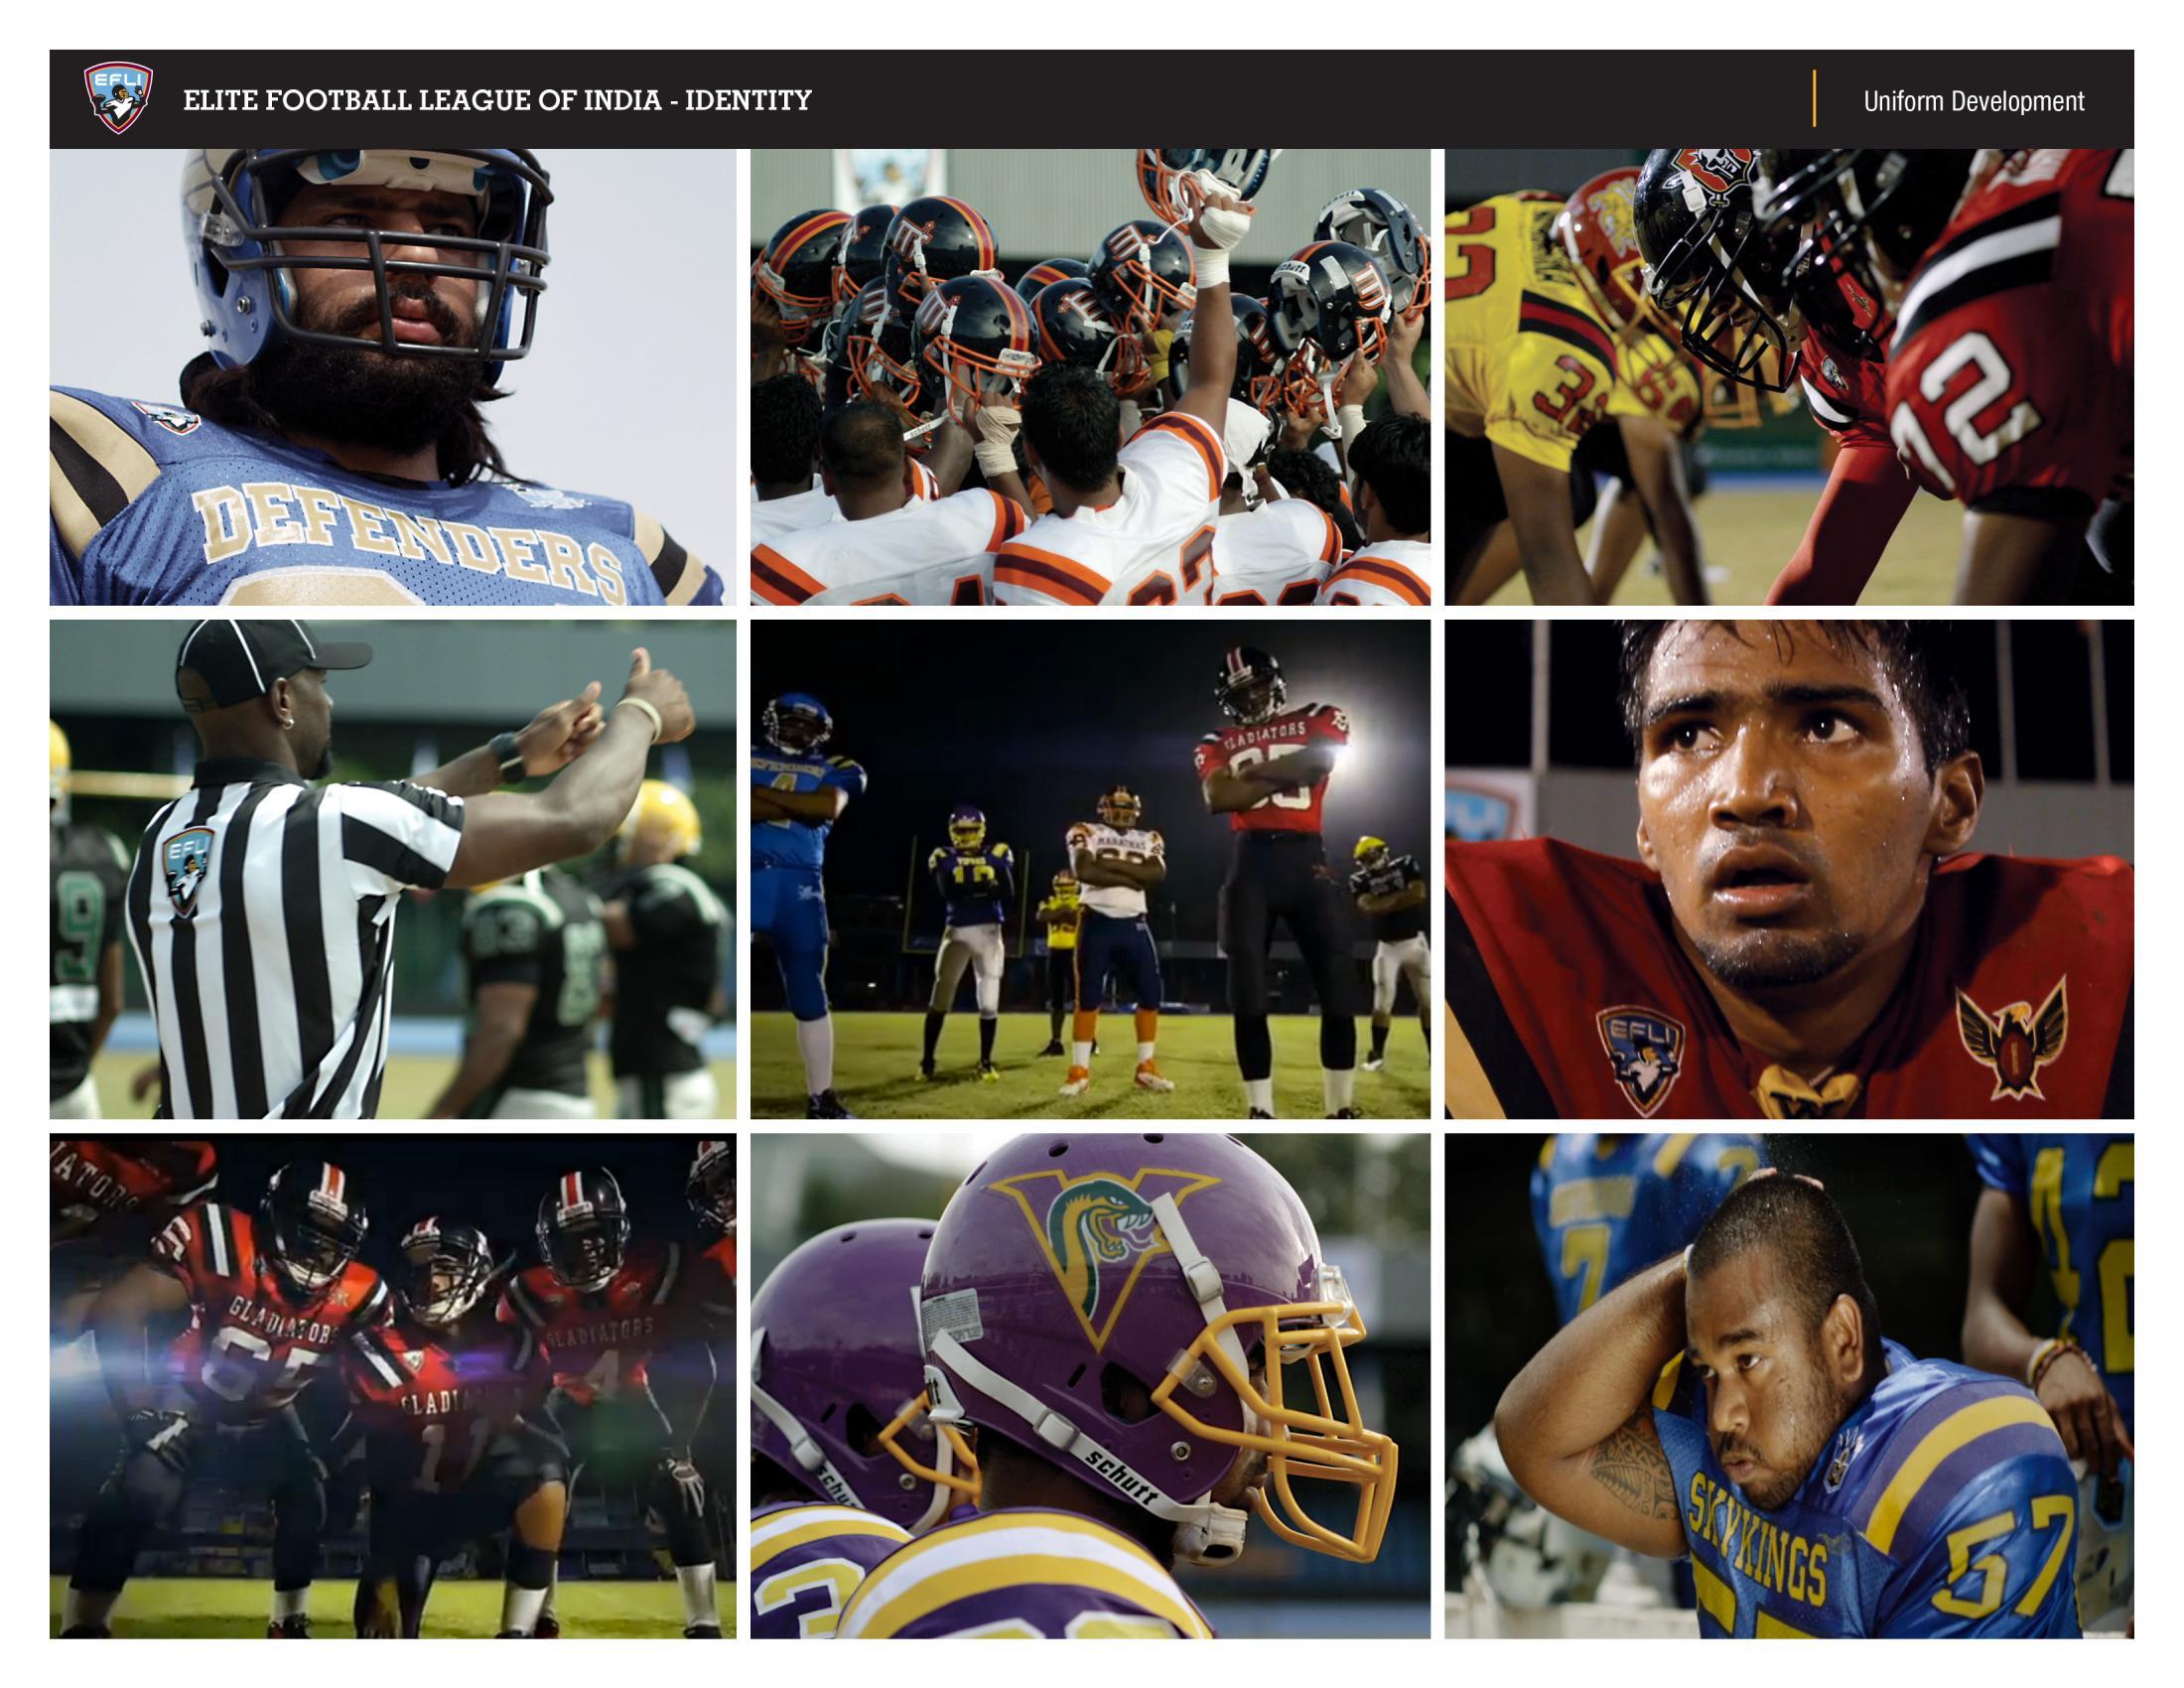 Thumbnail for Elite Football League of India Brand Identity